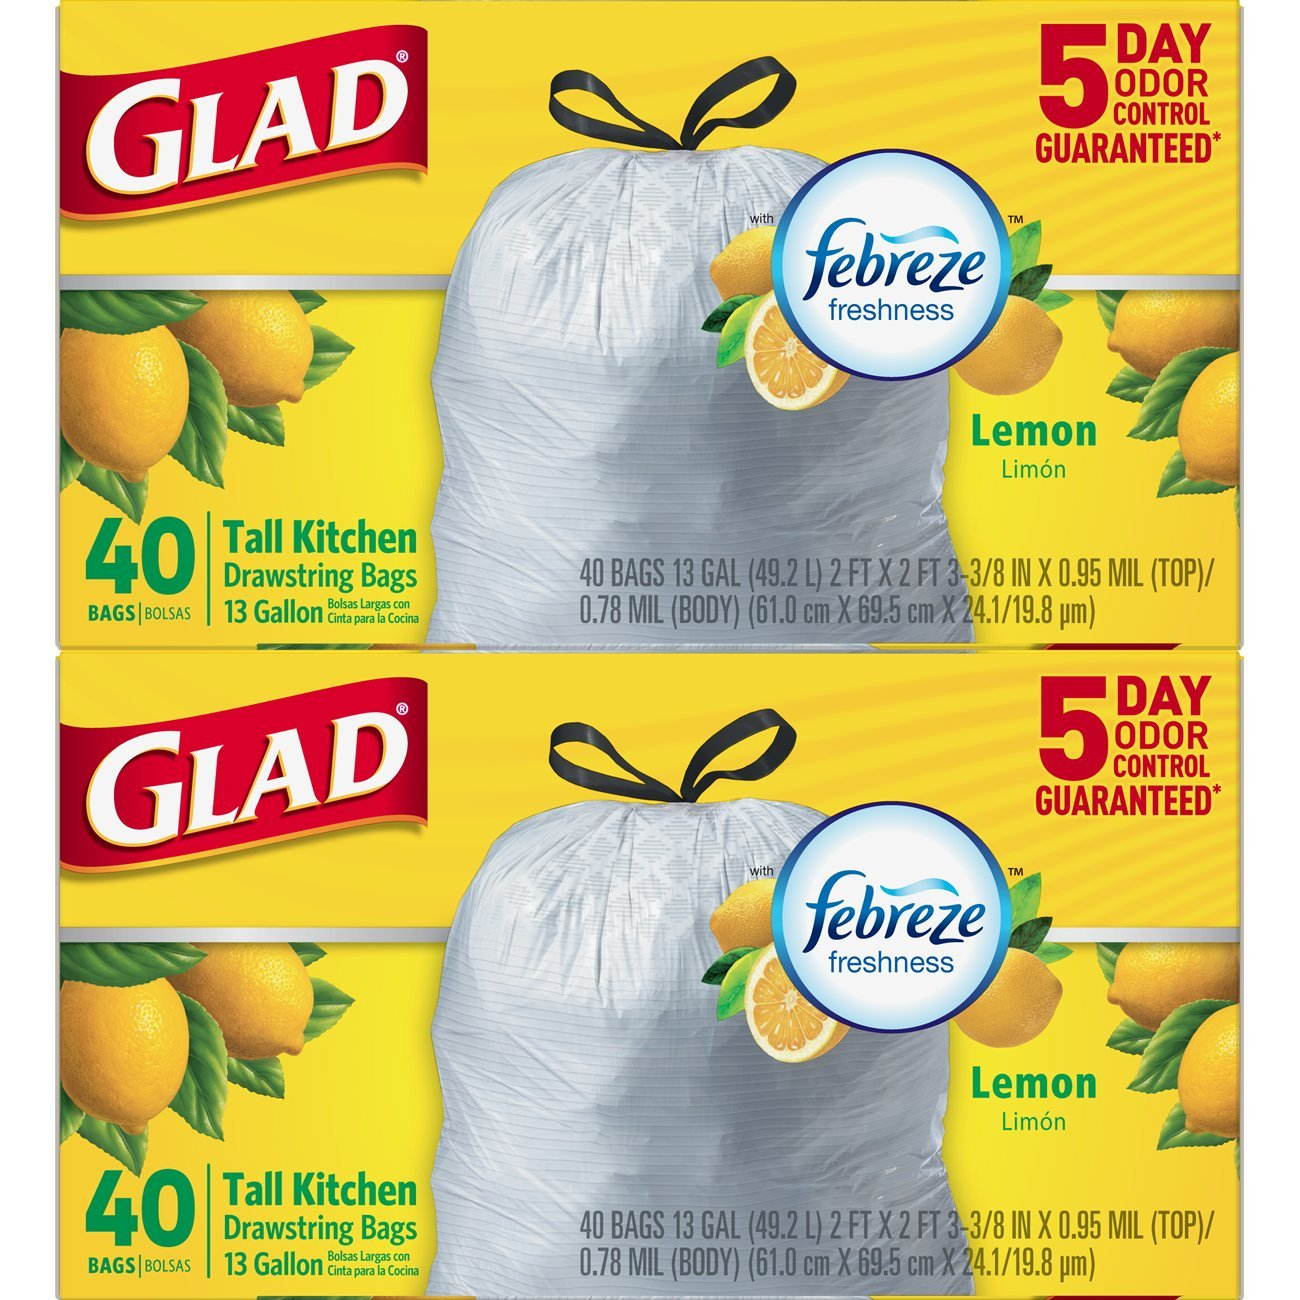 Glad Odorshield Tall Kitchen Drawstring Trash Bags, Lemon, 13 gal, 40 Count, (Pack of 2)